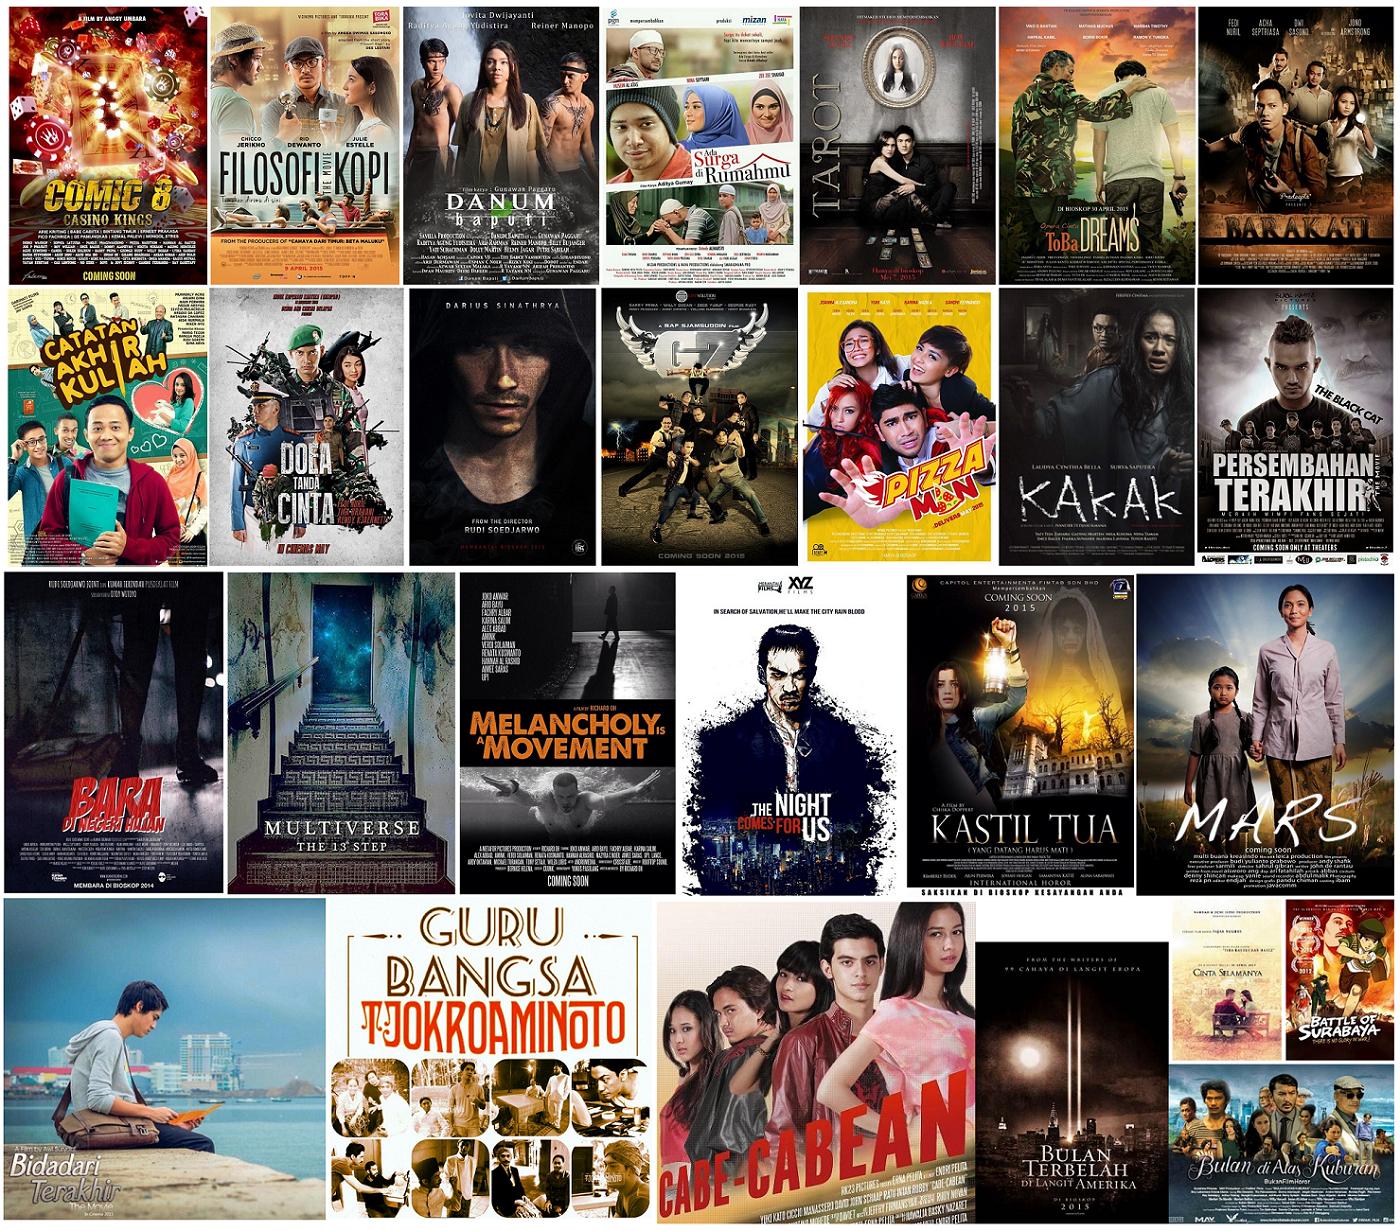 layar kaca terbaru april 2013